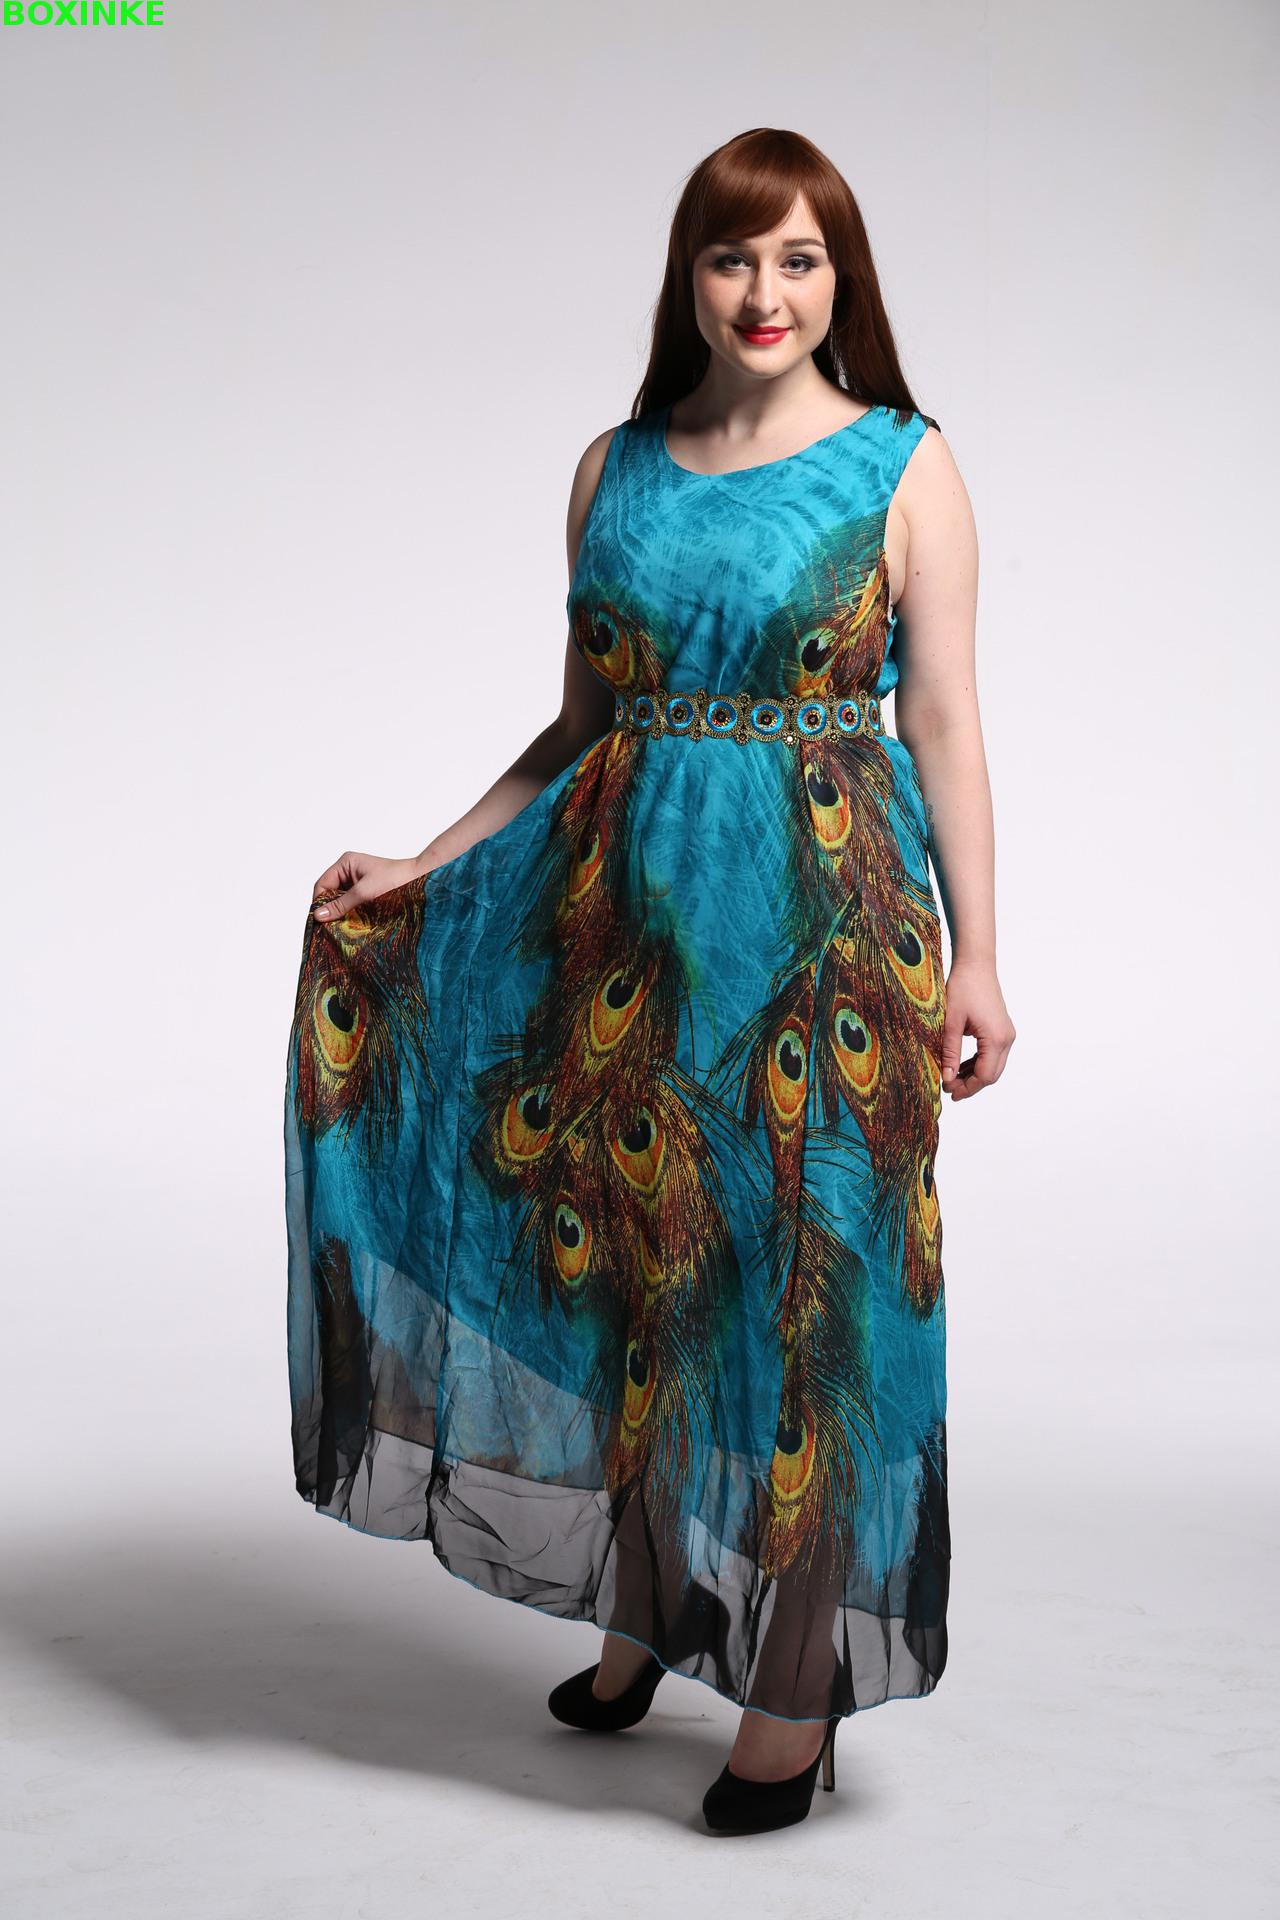 Vadim Maxi Dress Limited Bohemian A line Print Robe And Summer Women s New Set Bohemia